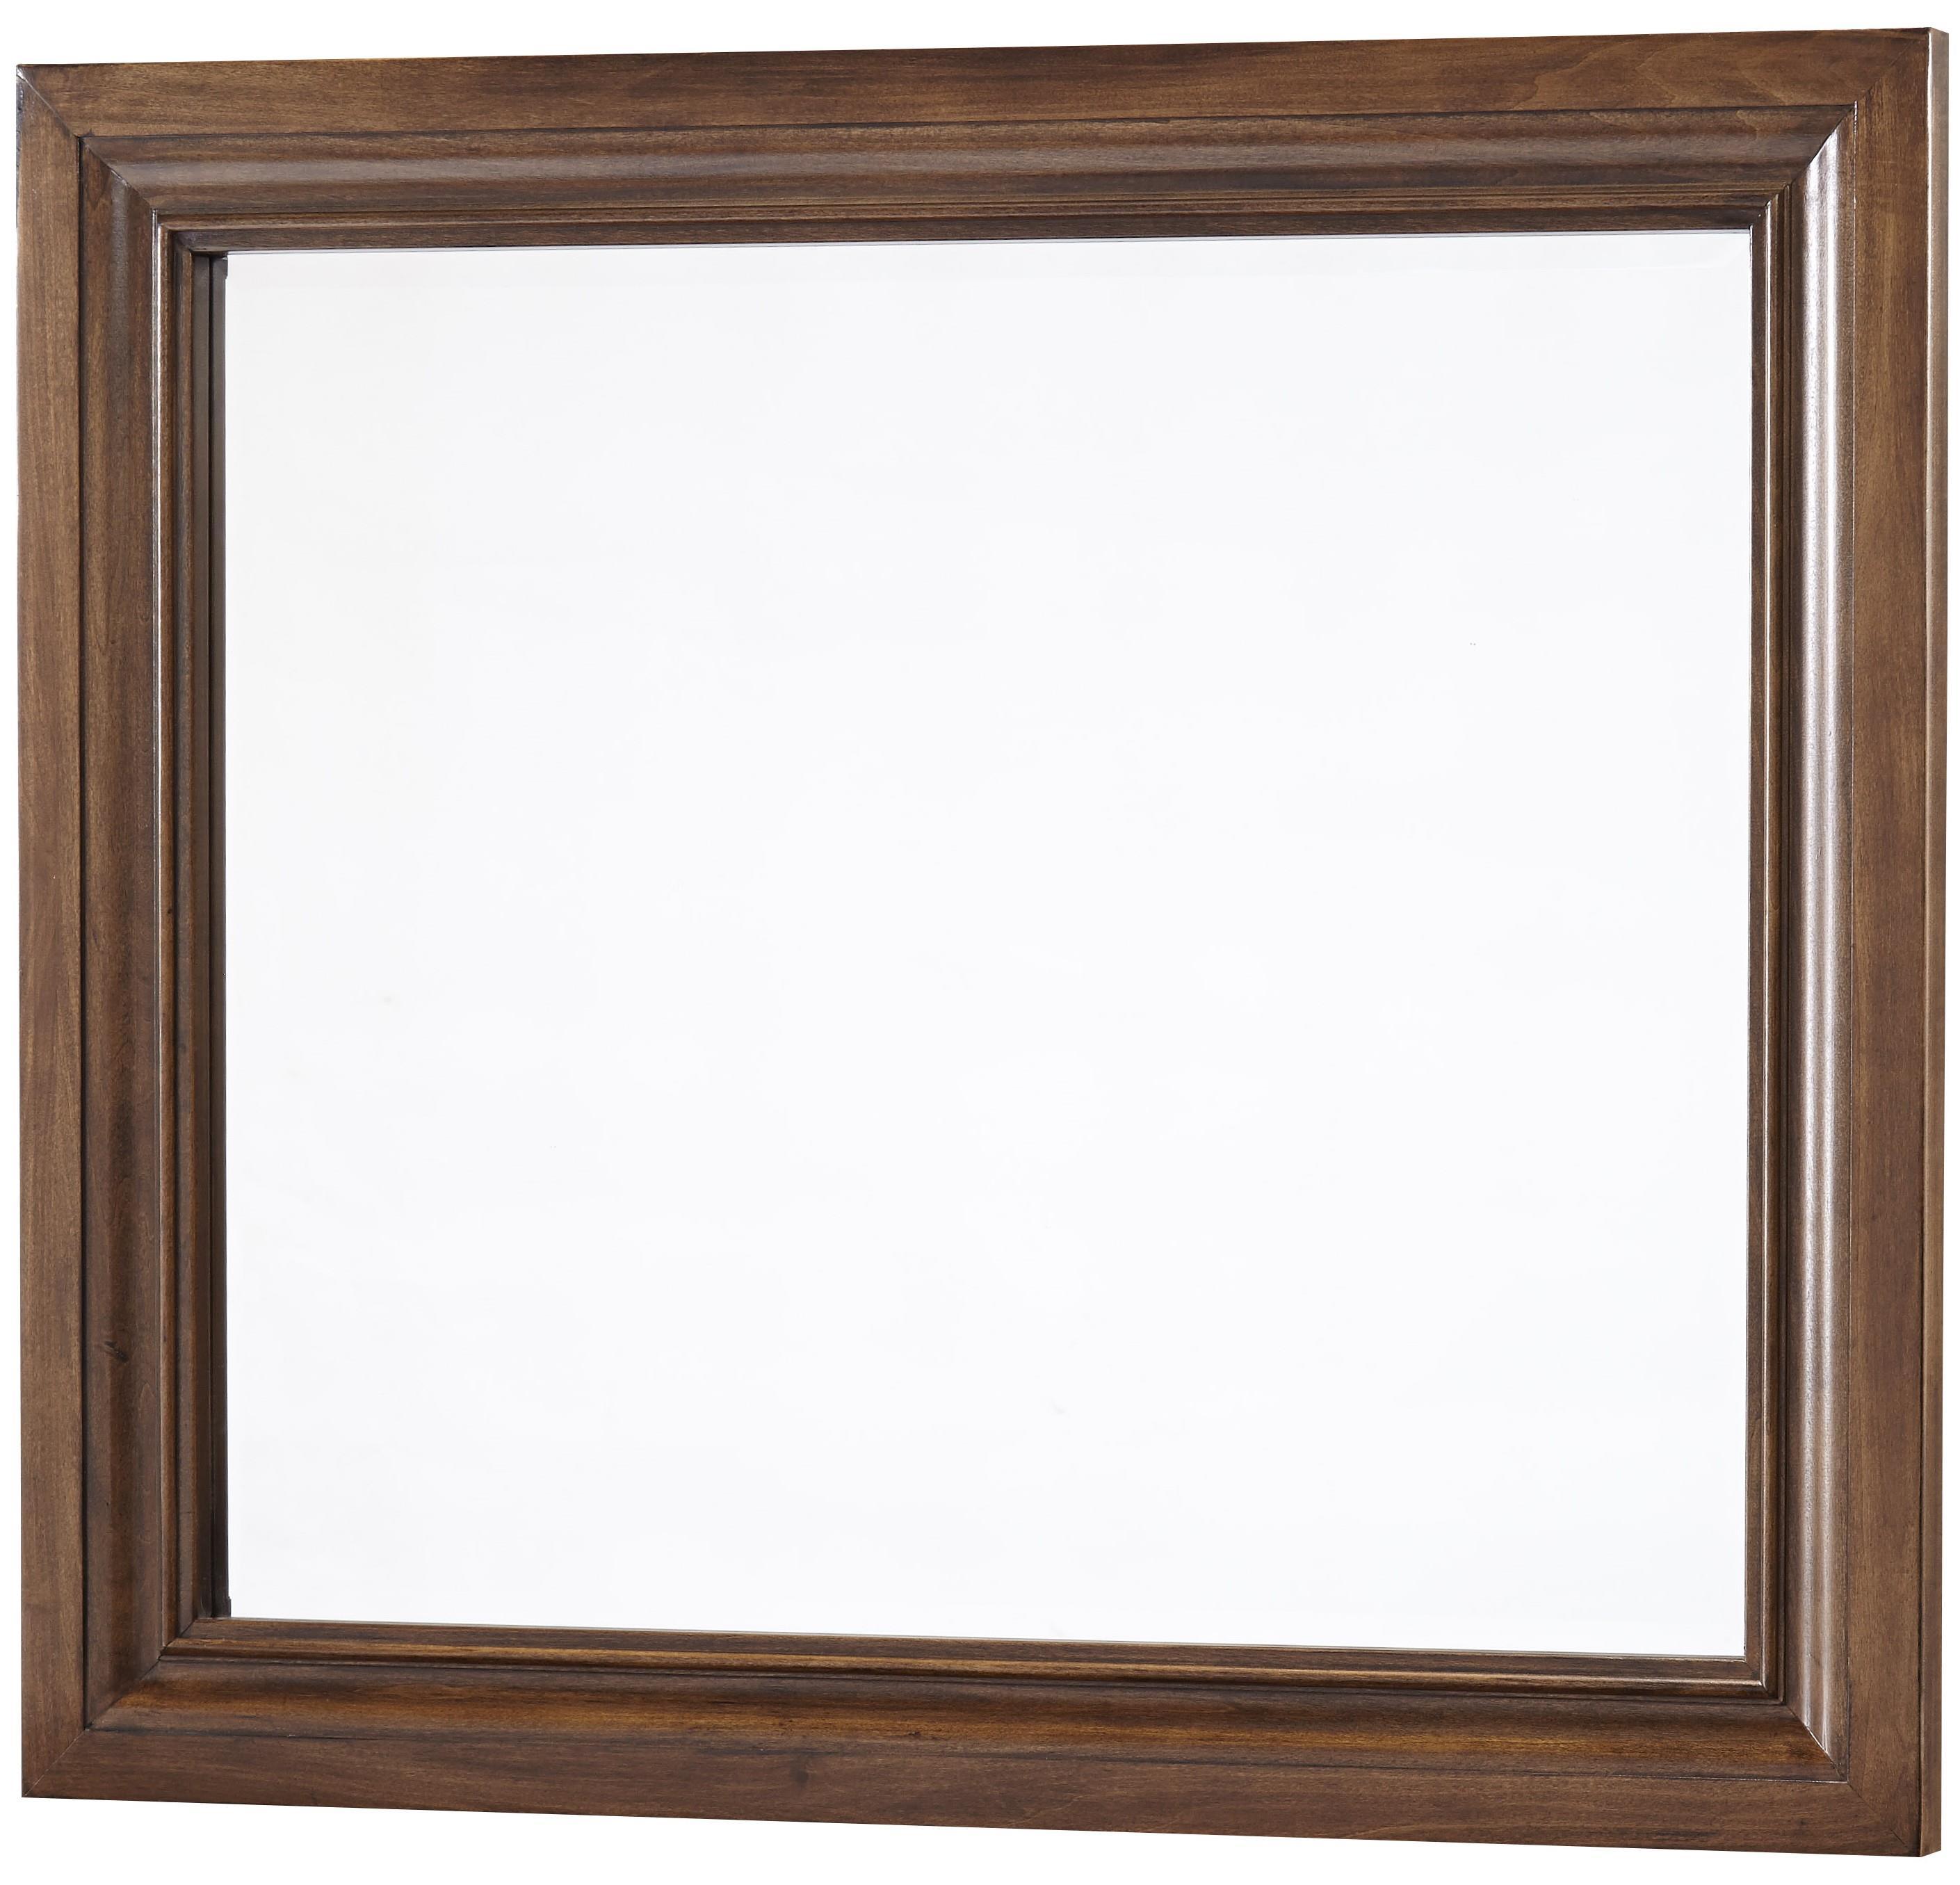 Vaughan Bassett Affinity Landscape Mirror - Beveled glass - Item Number: 562-446